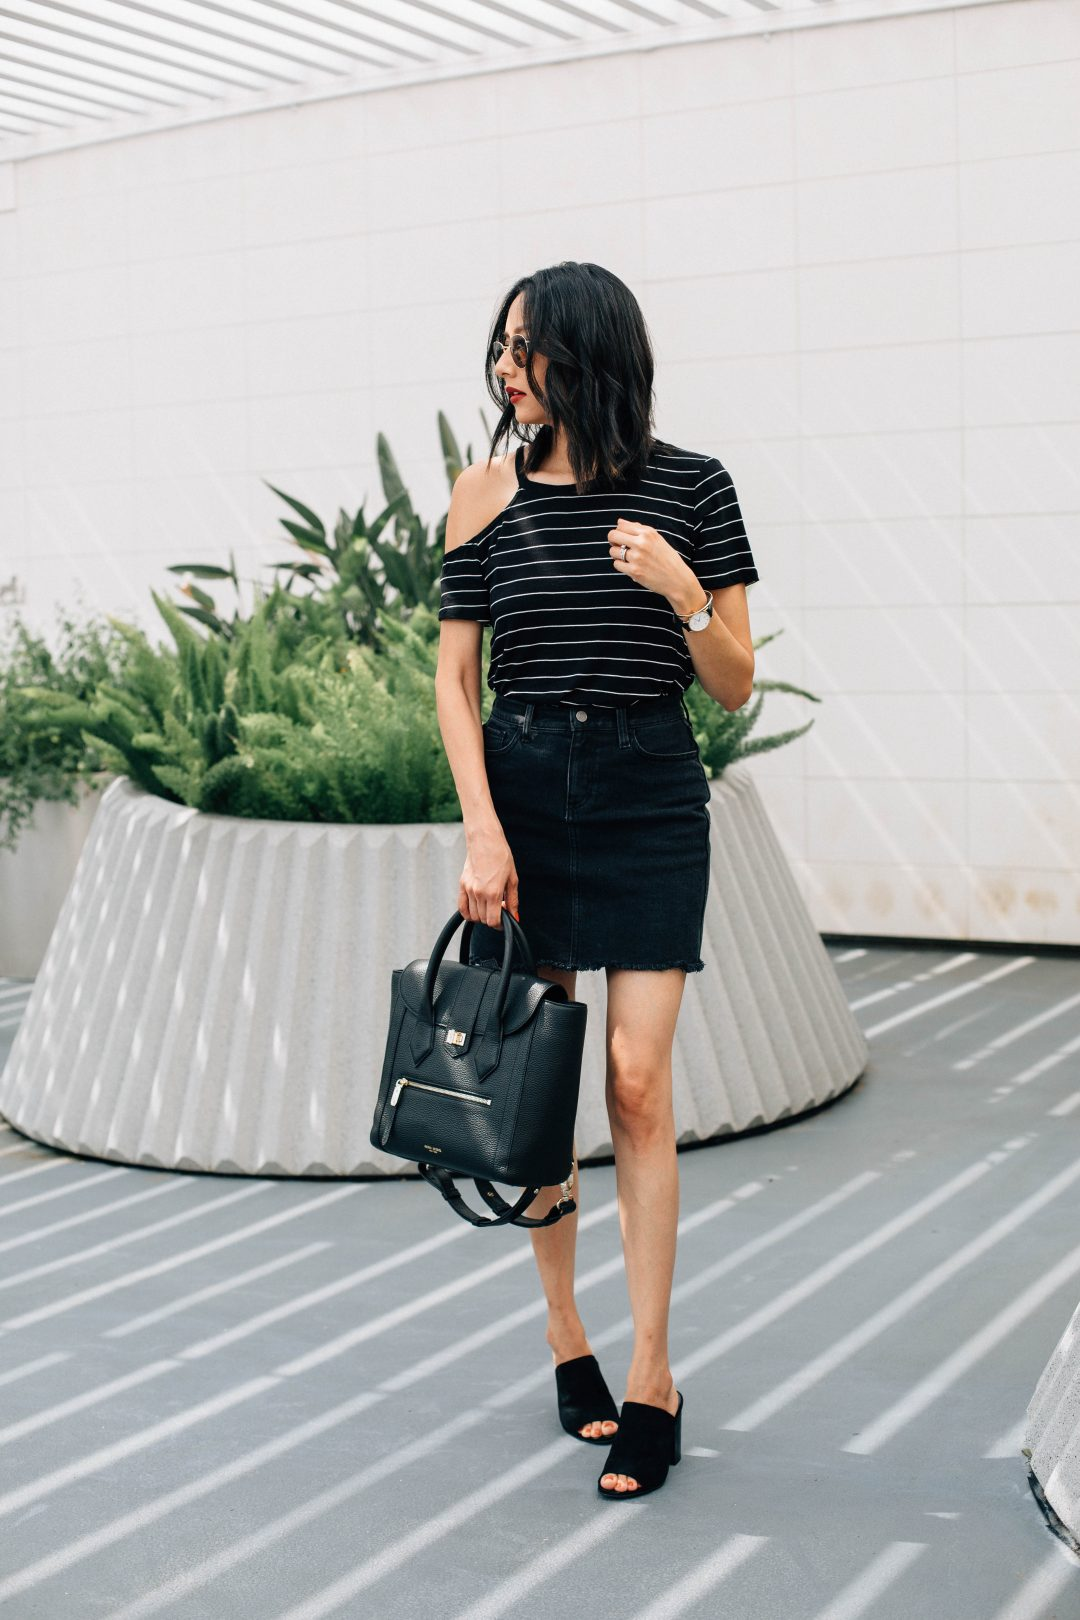 Houston fashion blogger Lilly Beltran styles a black denim mini skirt for an effortless chic date night look